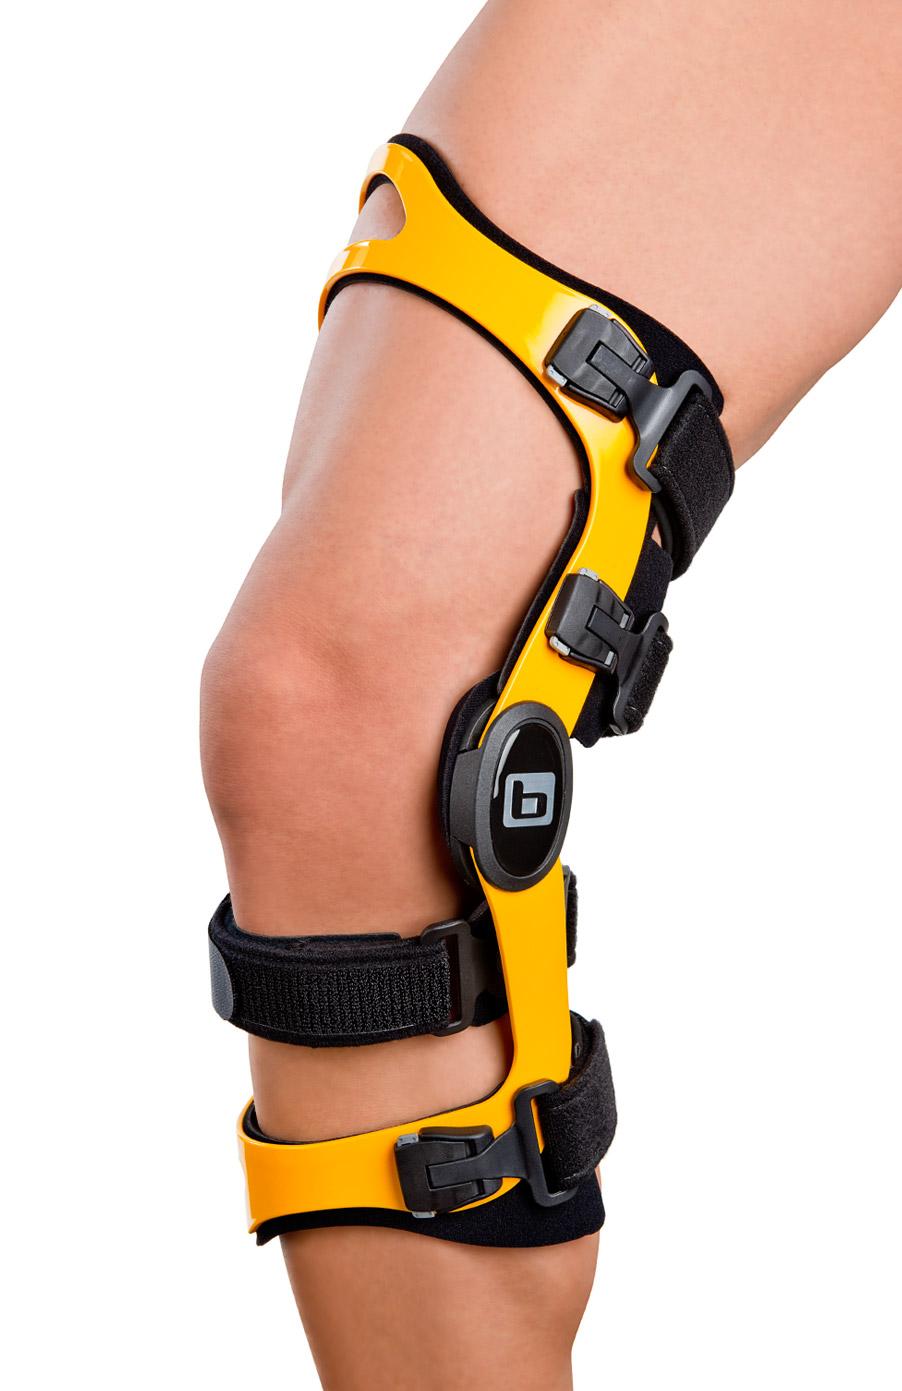 Bledsoe knee brace